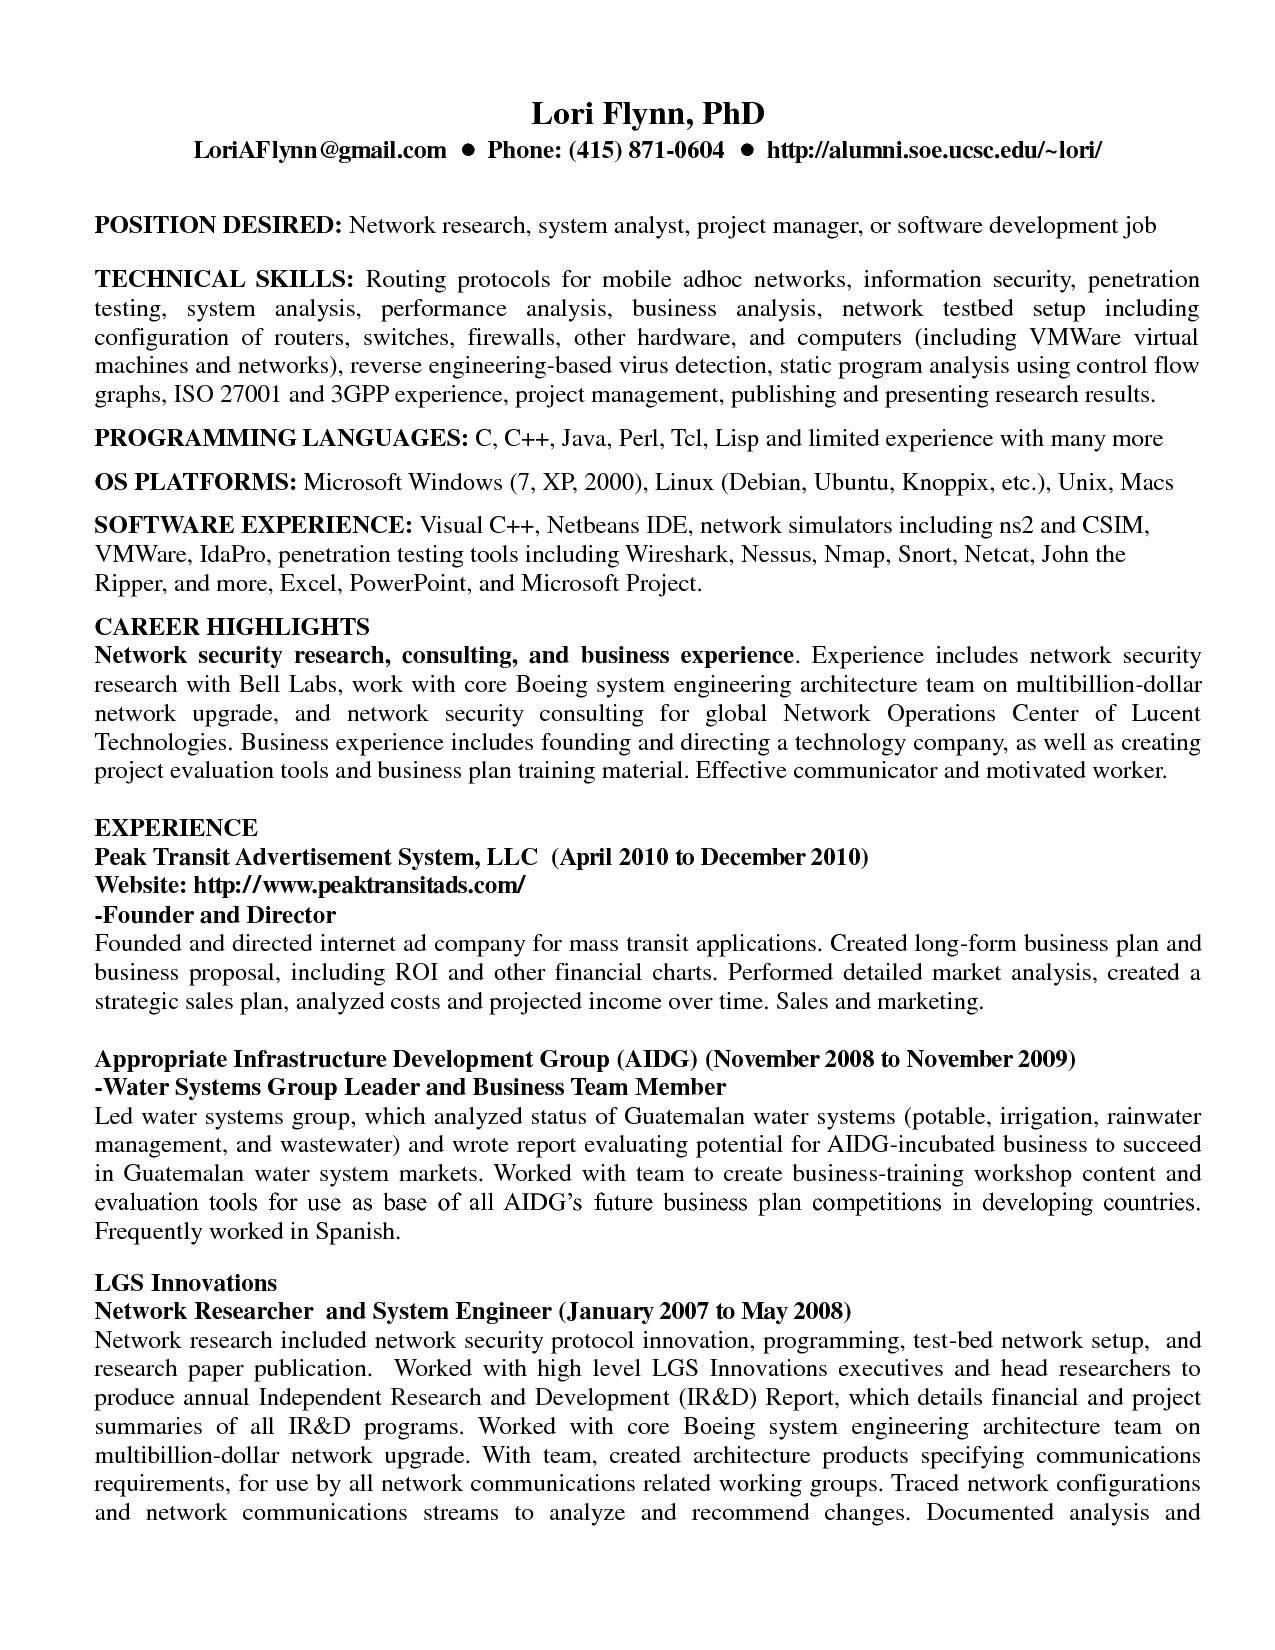 stationary engineer resume sample beautiful fire alarm system engineer resume gseokbinder